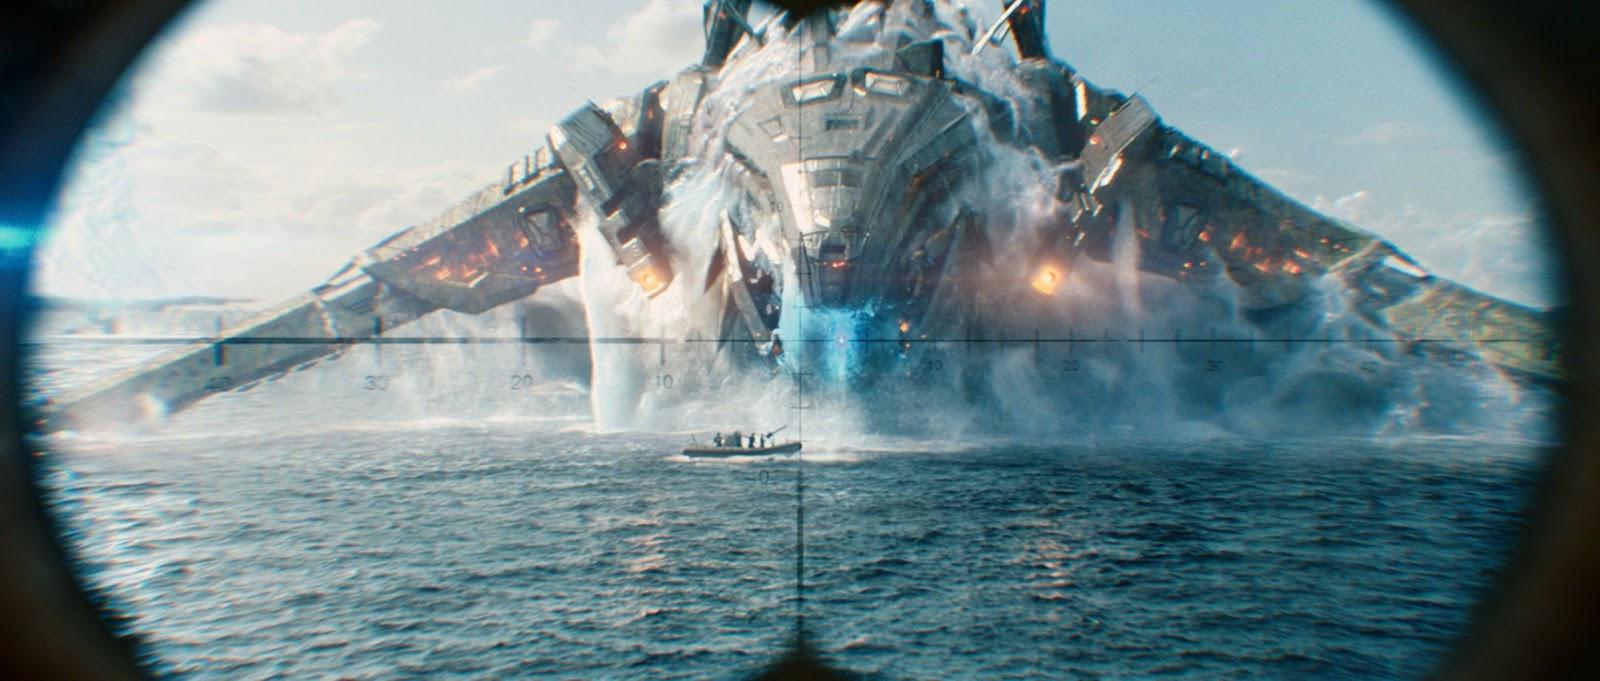 phim chiến hạm 2012